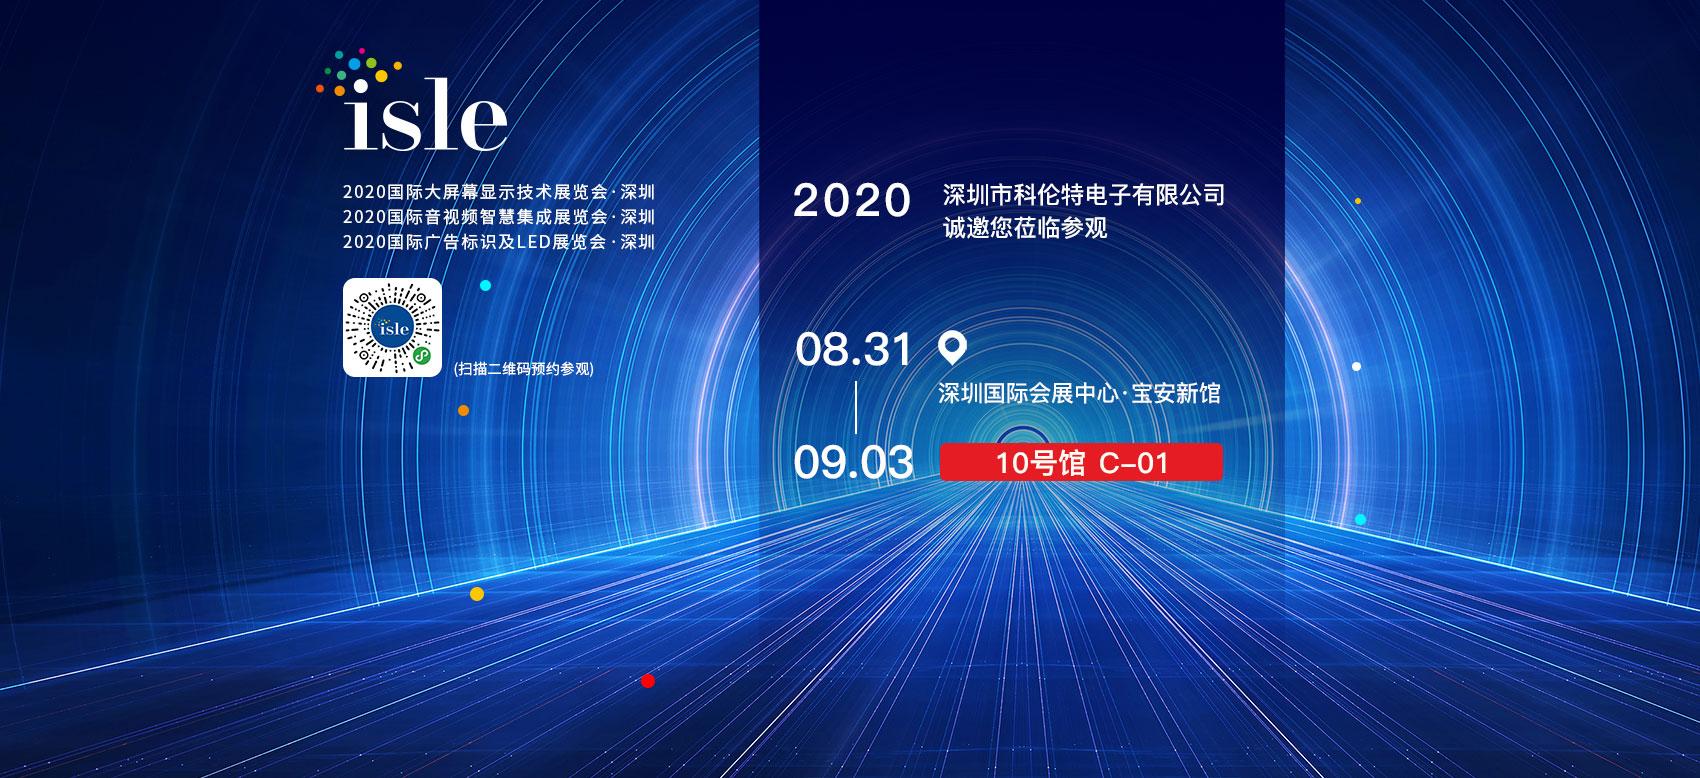 ISLE 2020 十天倒计时,最新参展攻略请查收